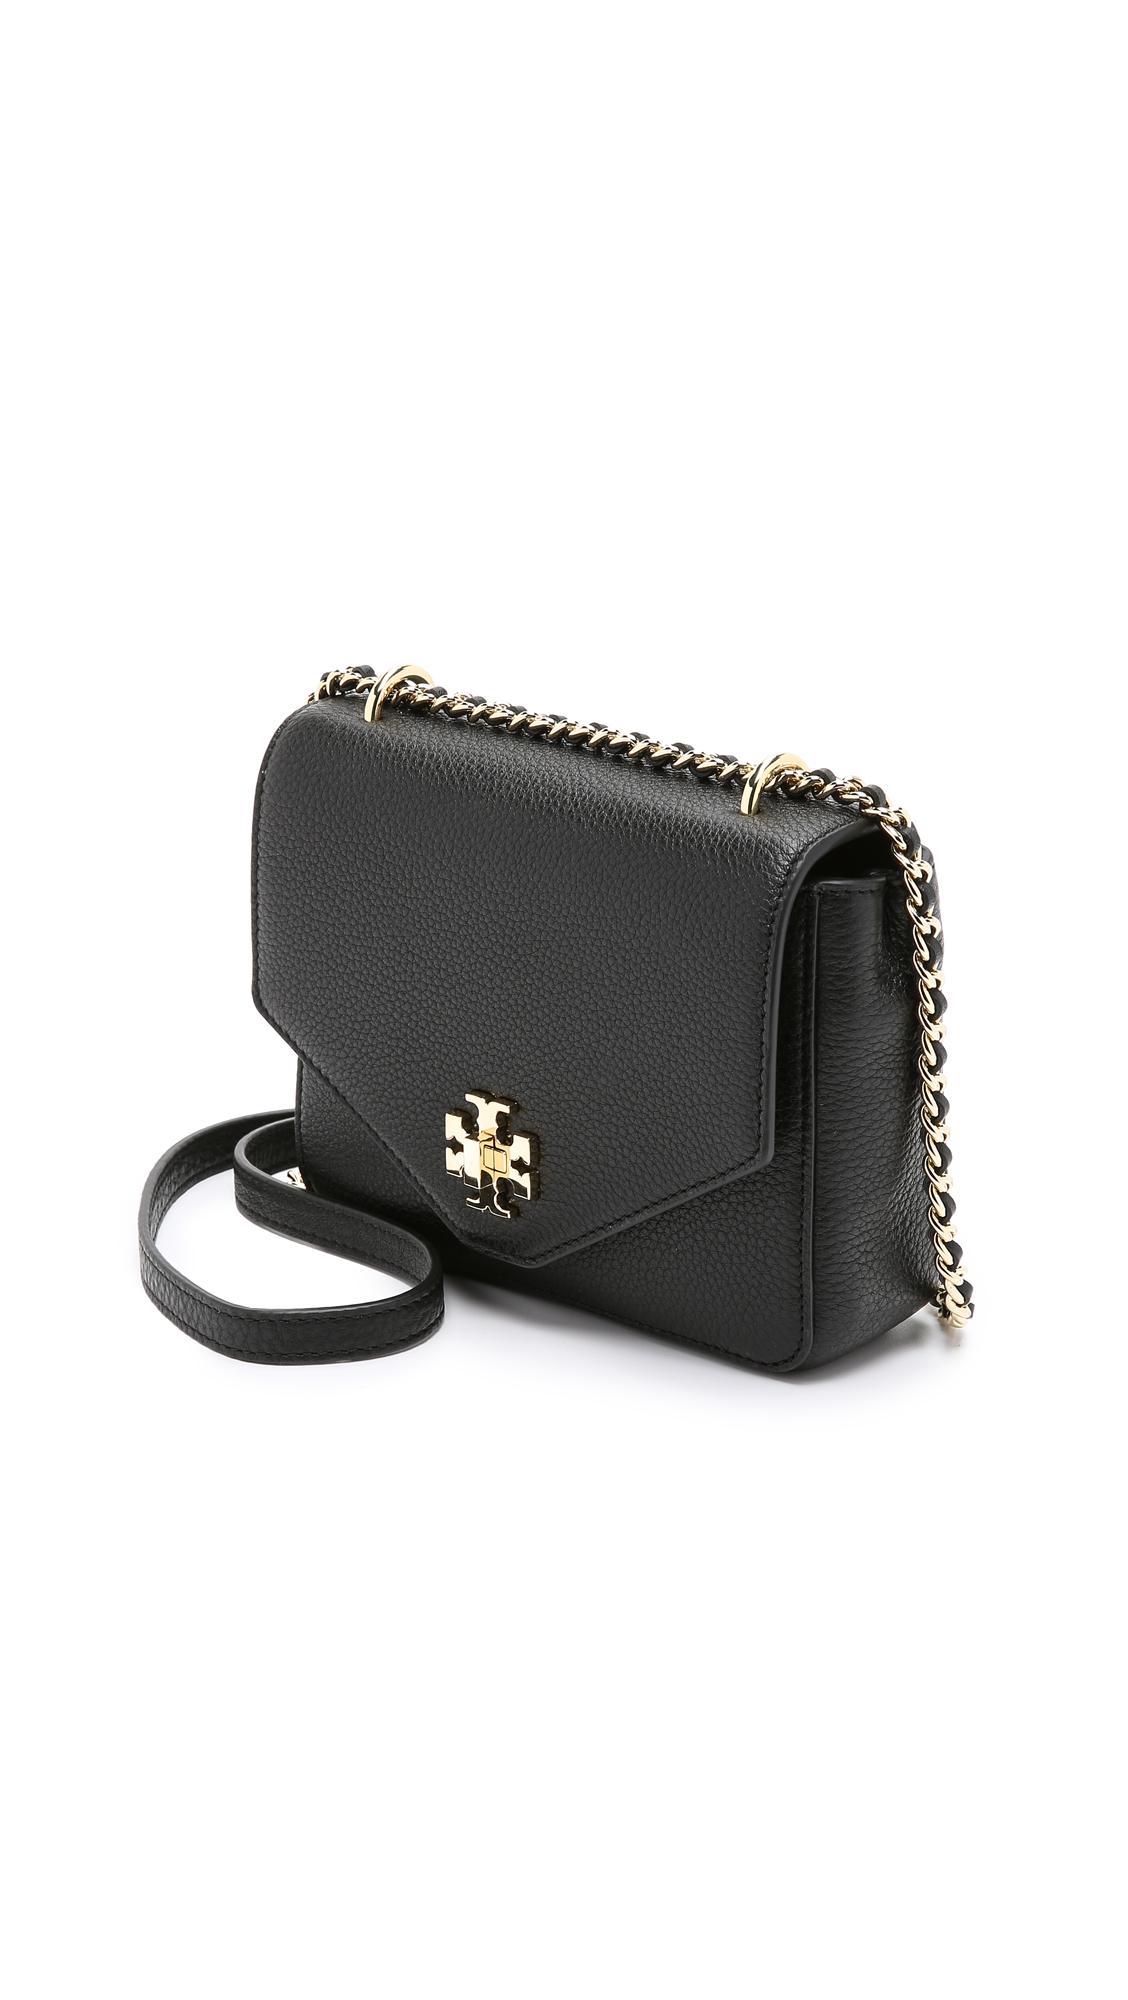 6345077751d Lyst - Tory Burch Kira Mini Chain Cross Body Bag in Black